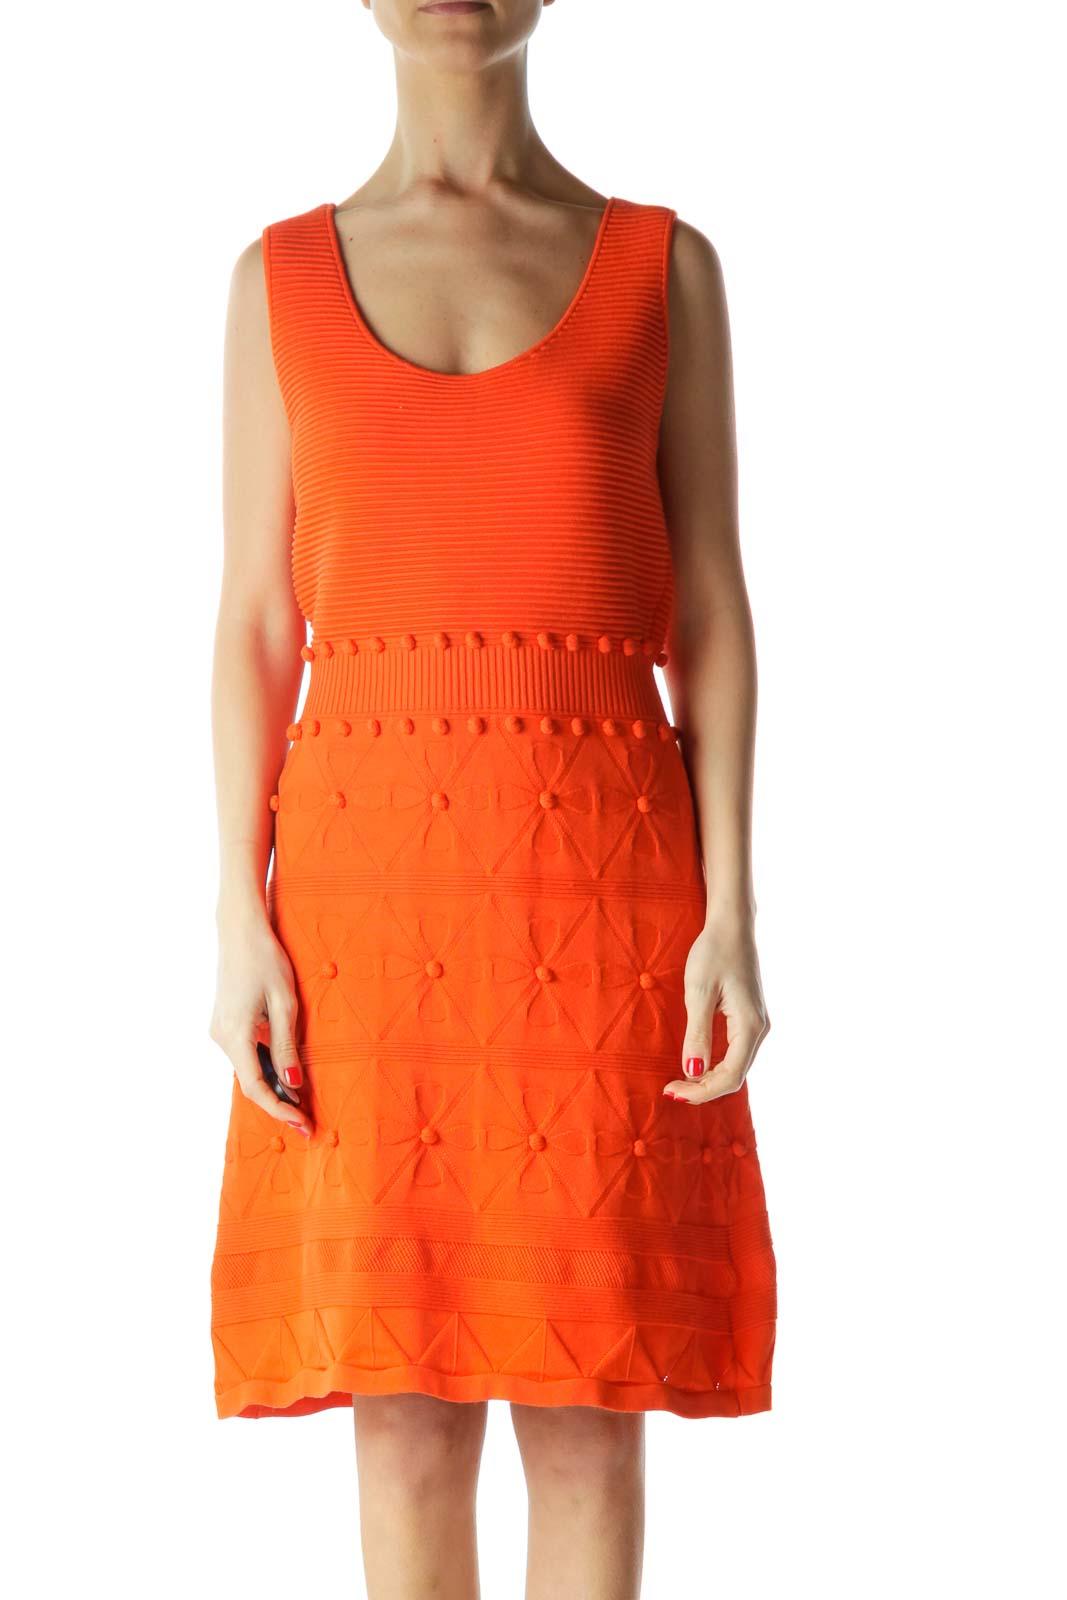 Orange Sleeveless Knit Dress Front